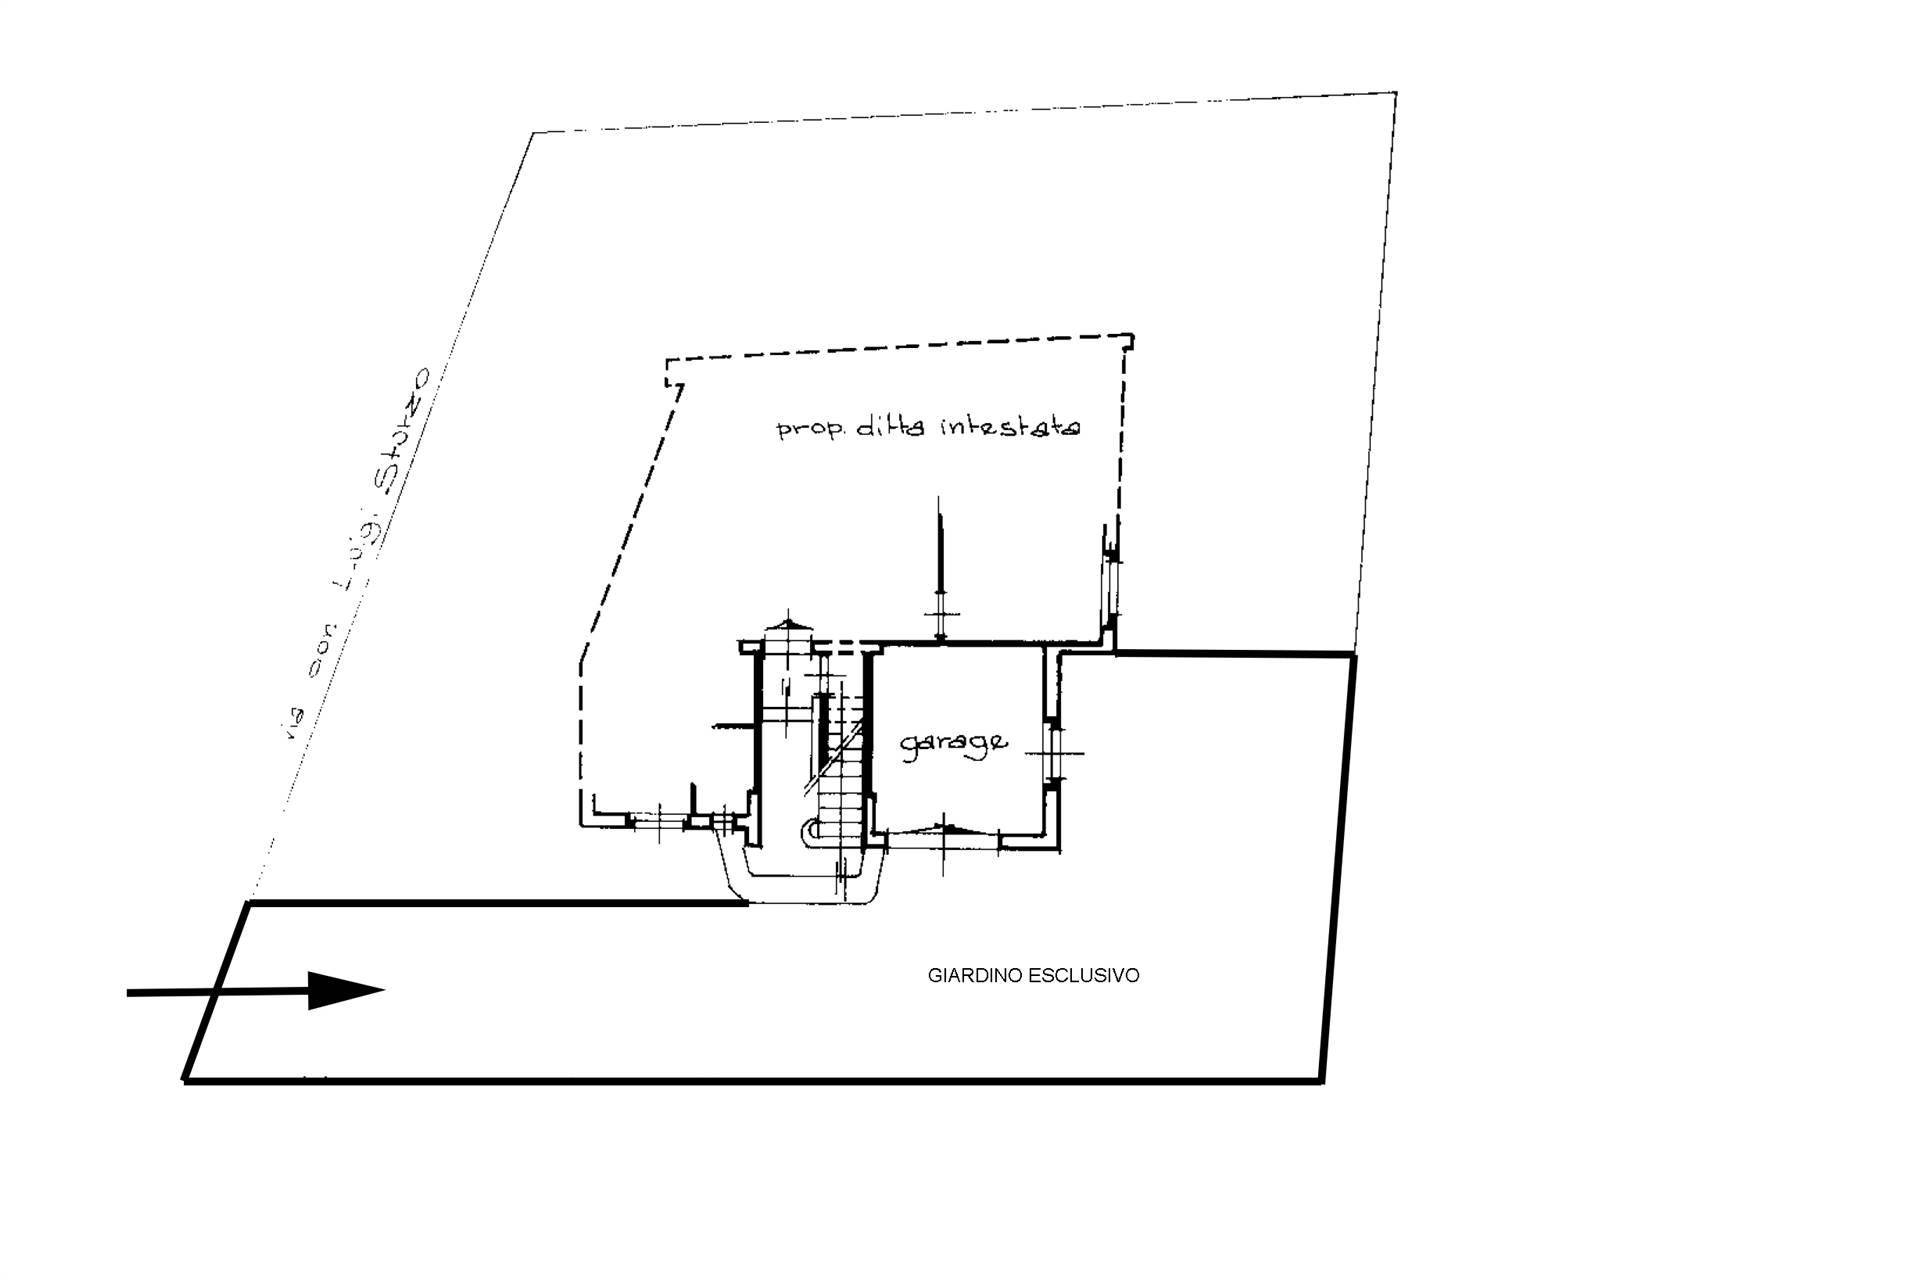 Planimetria garage e giardino